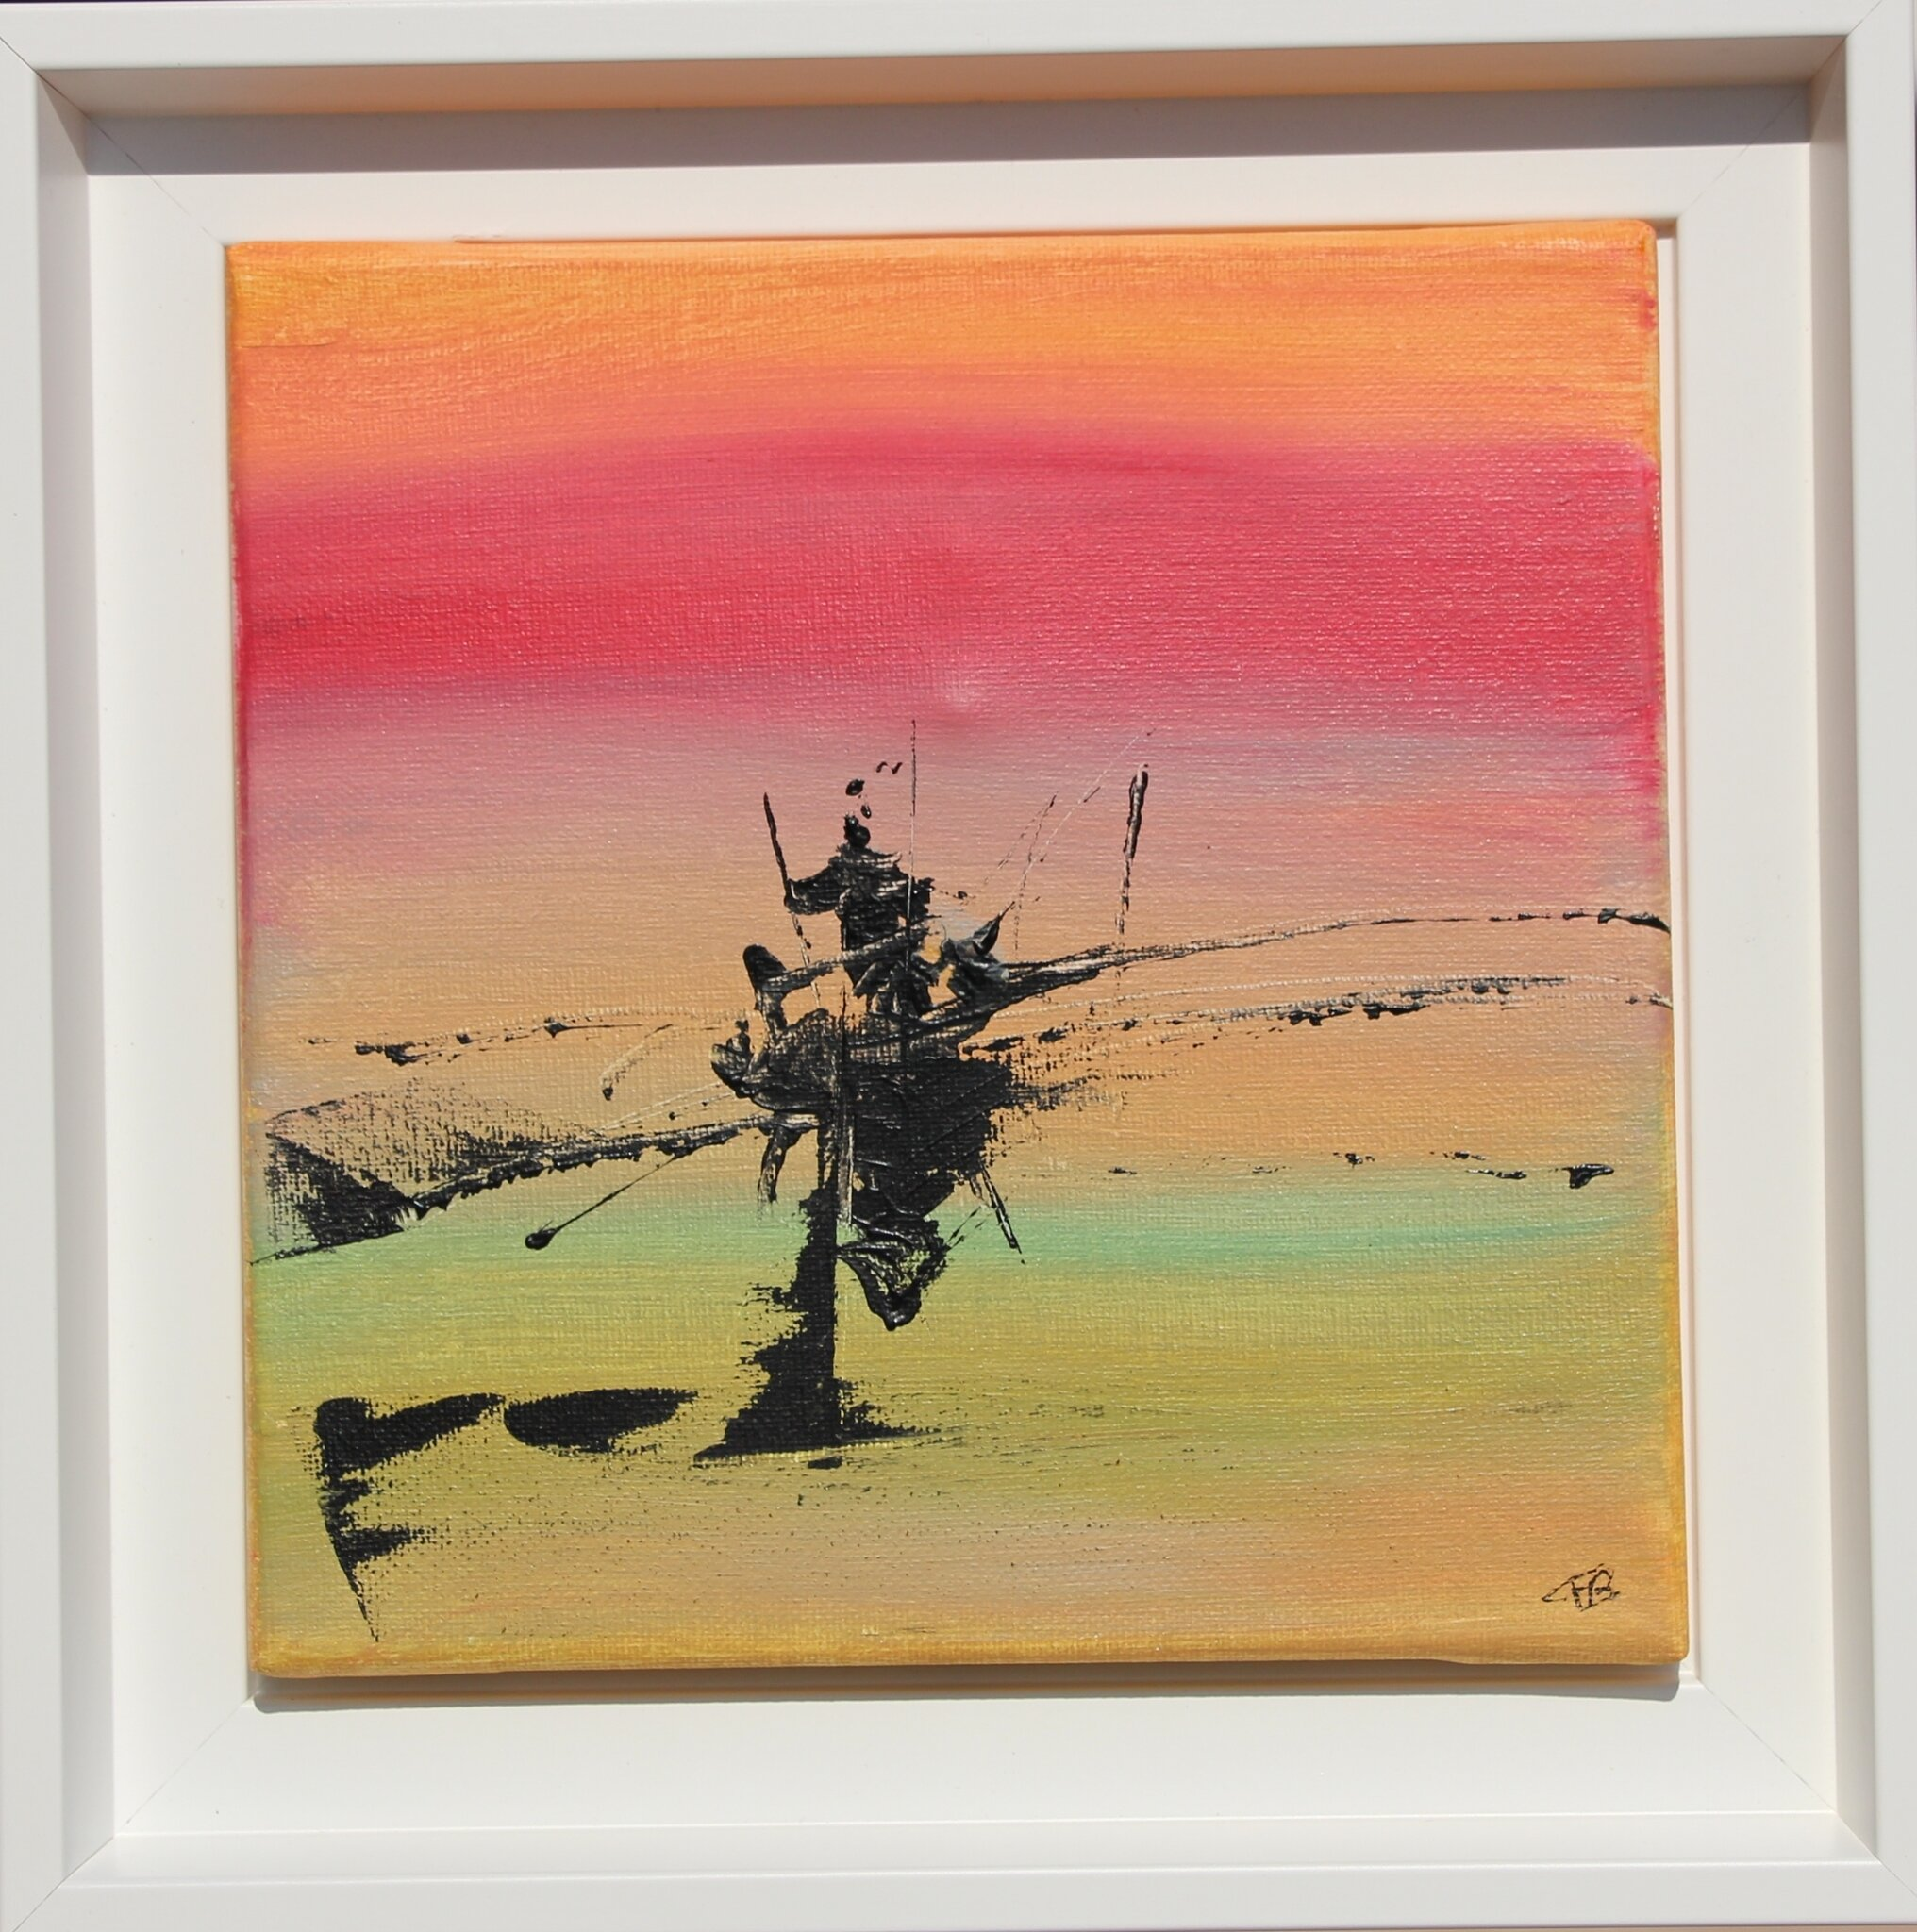 Traversée- acryl 2017- cadre blanc- 20X20 cm- (n°100)